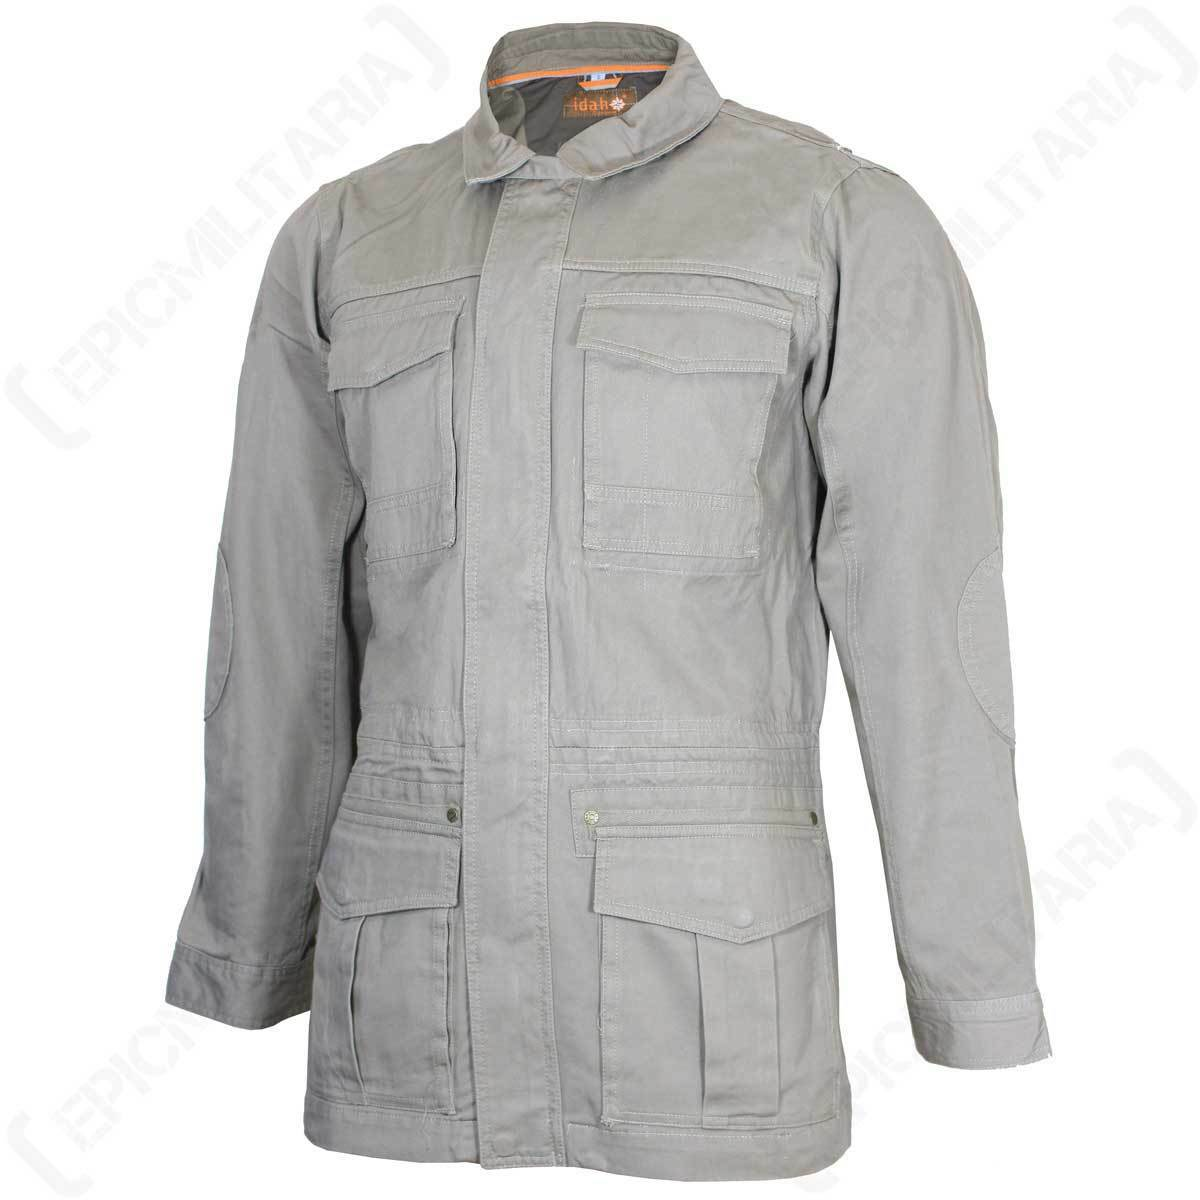 Light Khaki Jacket Top Cotton All Sizes New Percussion Saharienne Cargo Jacket